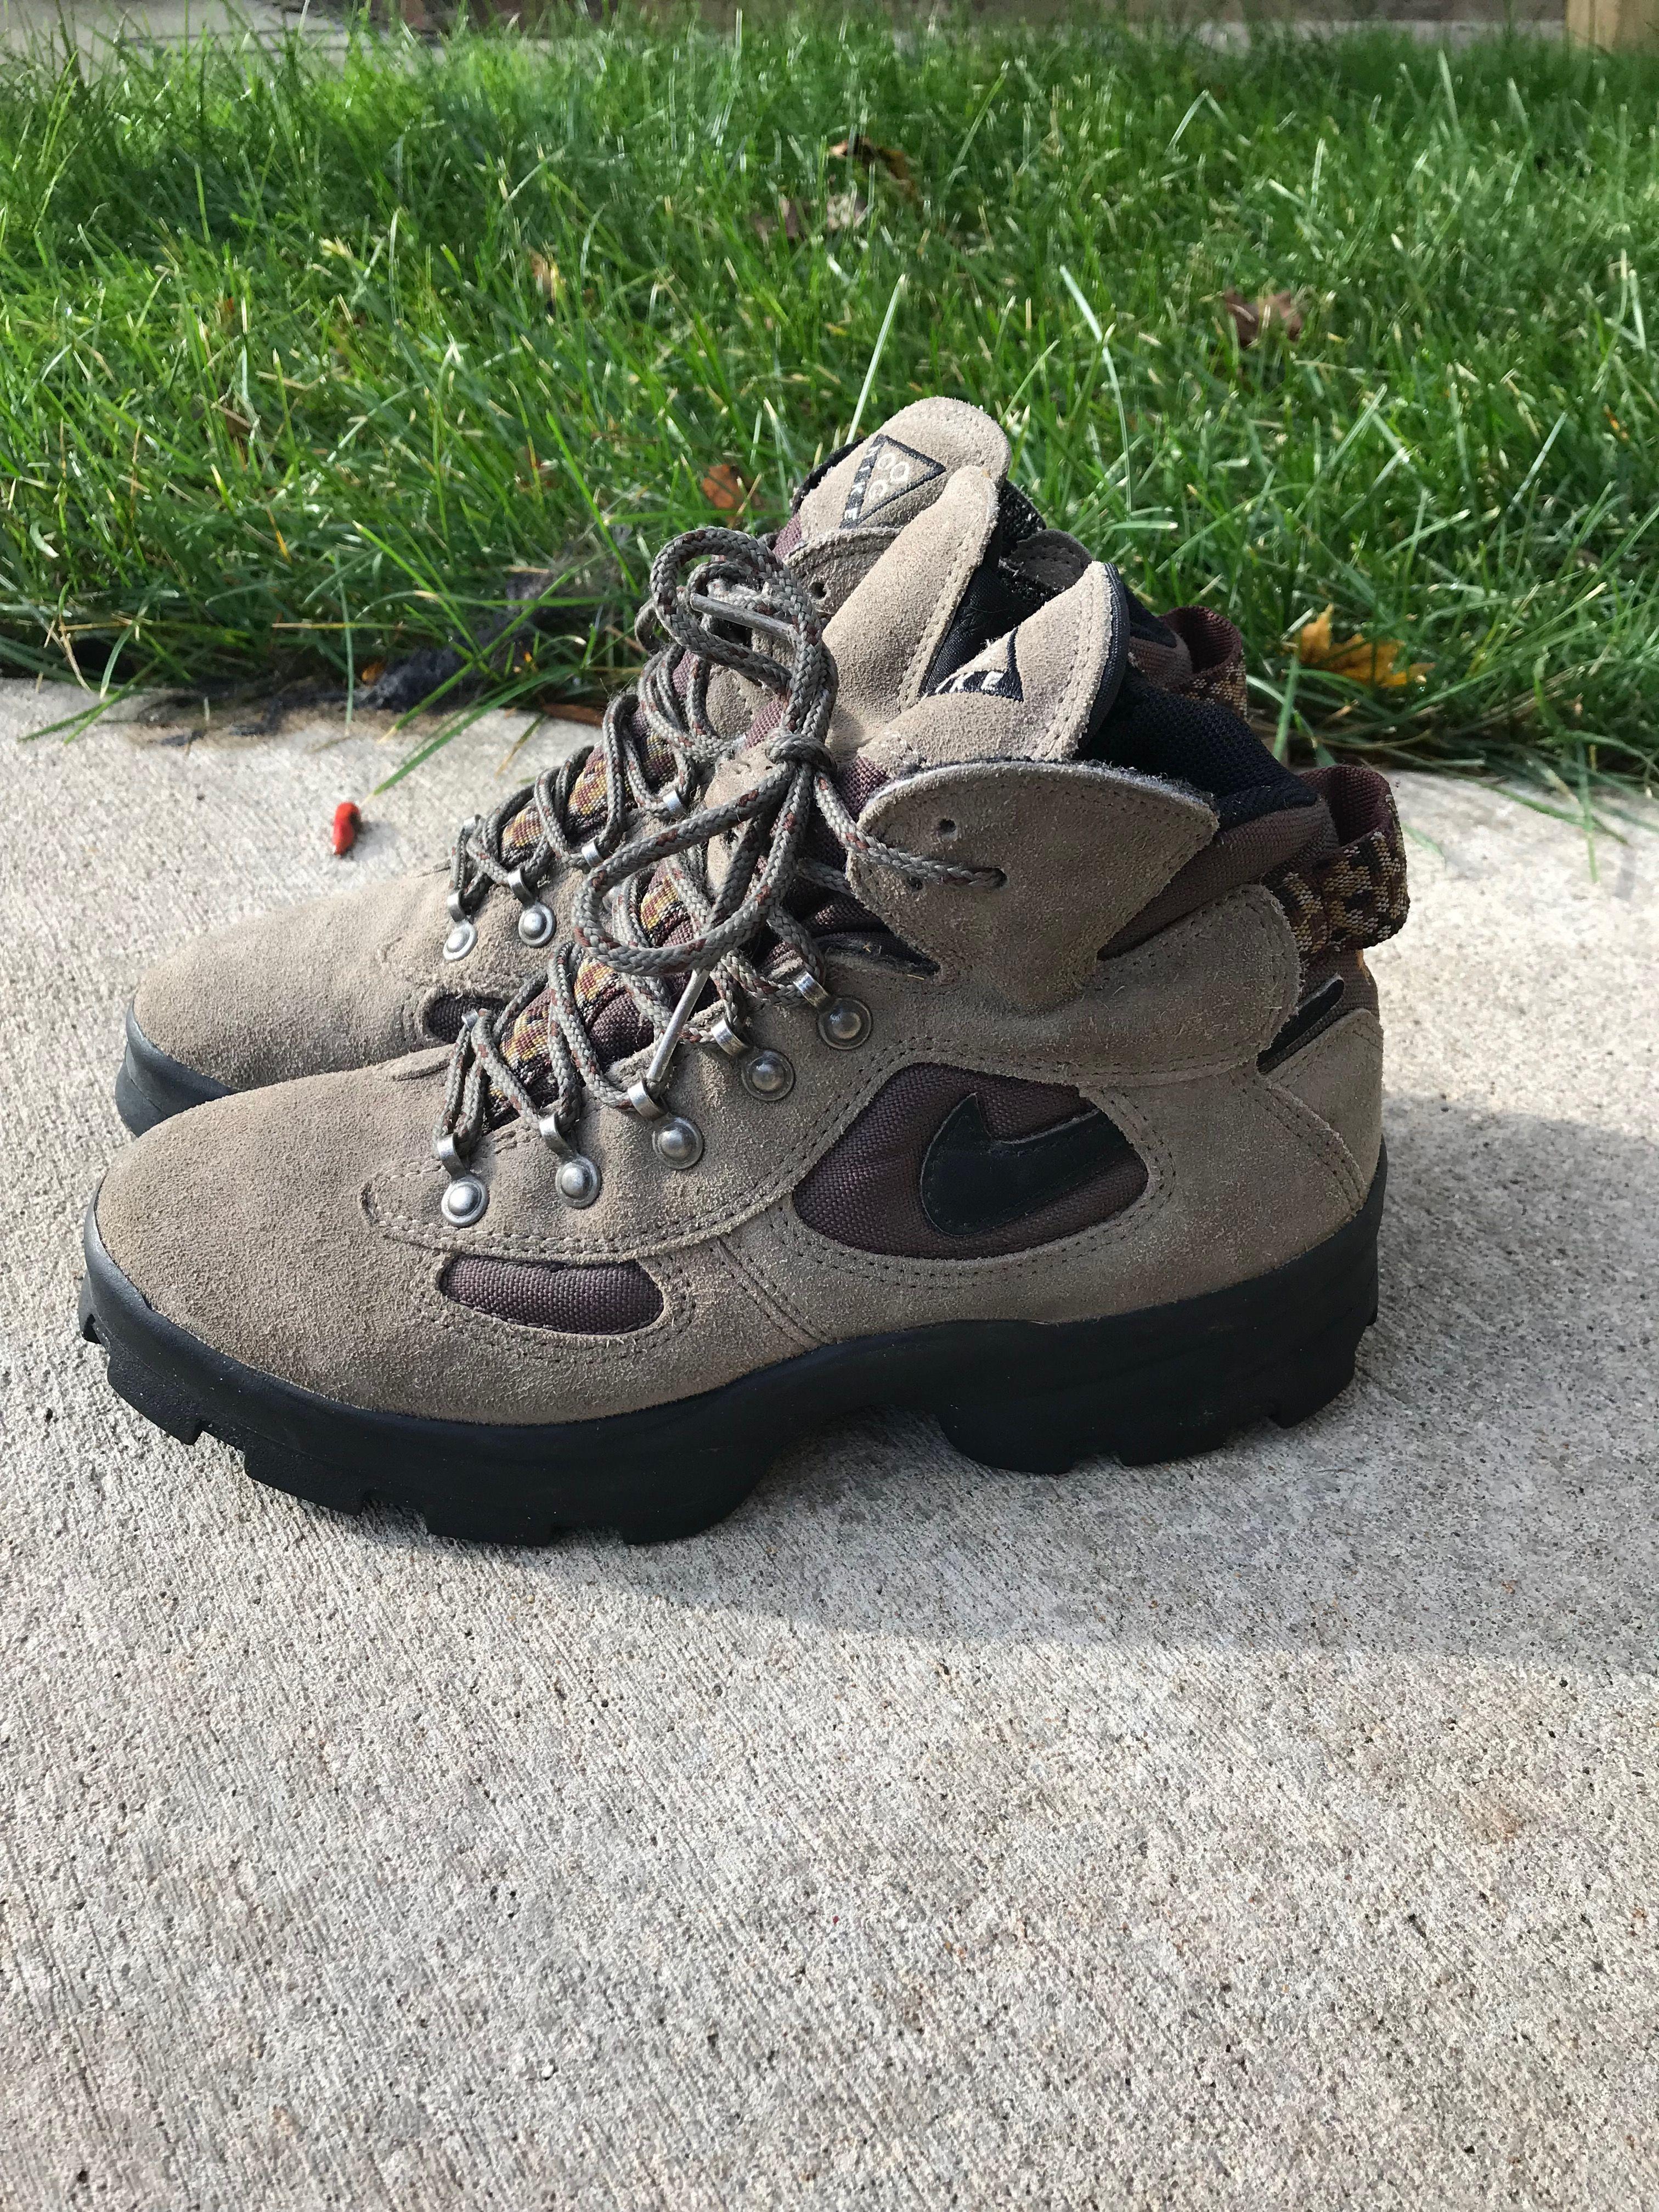 49+ Nike hiking boots womens ideas info